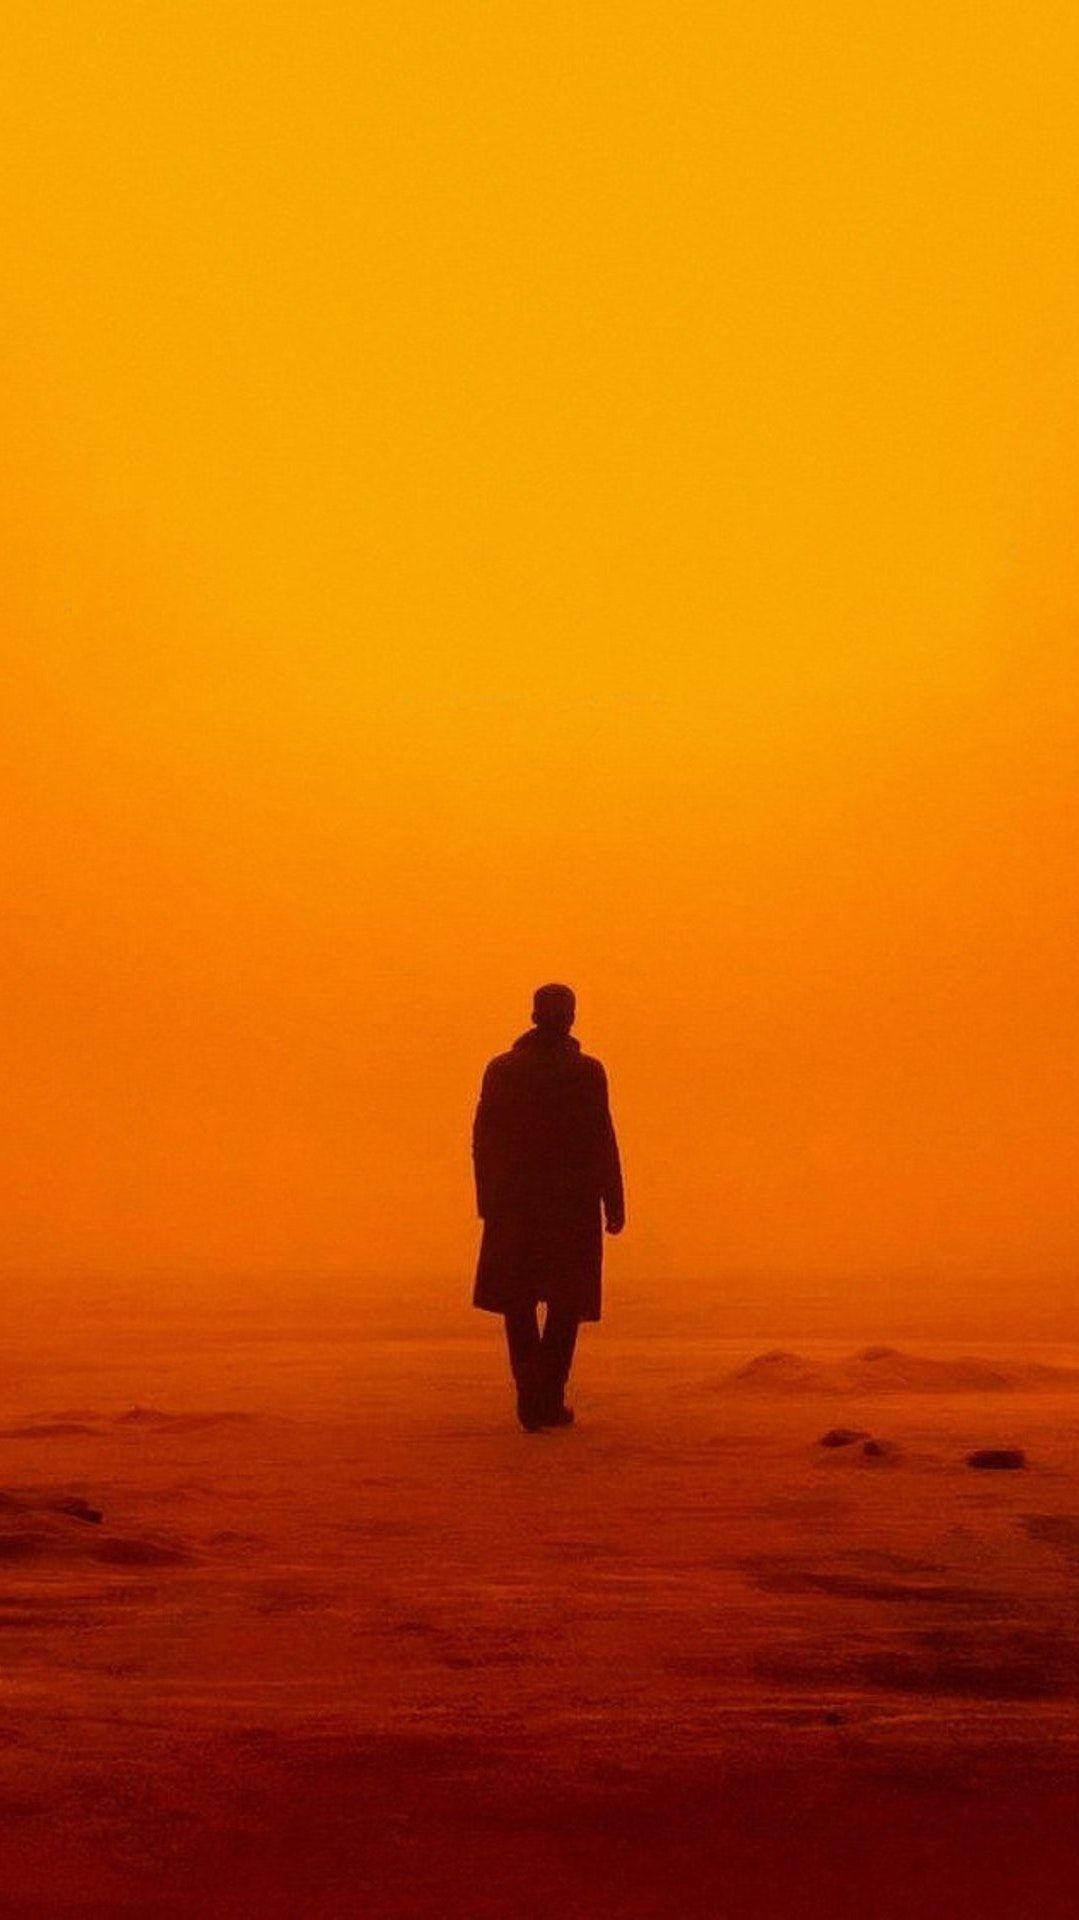 Blade Runner 2049 2017 Phone Wallpaper Moviemania Posteres De Filmes Posters De Filmes Imagens Filmes